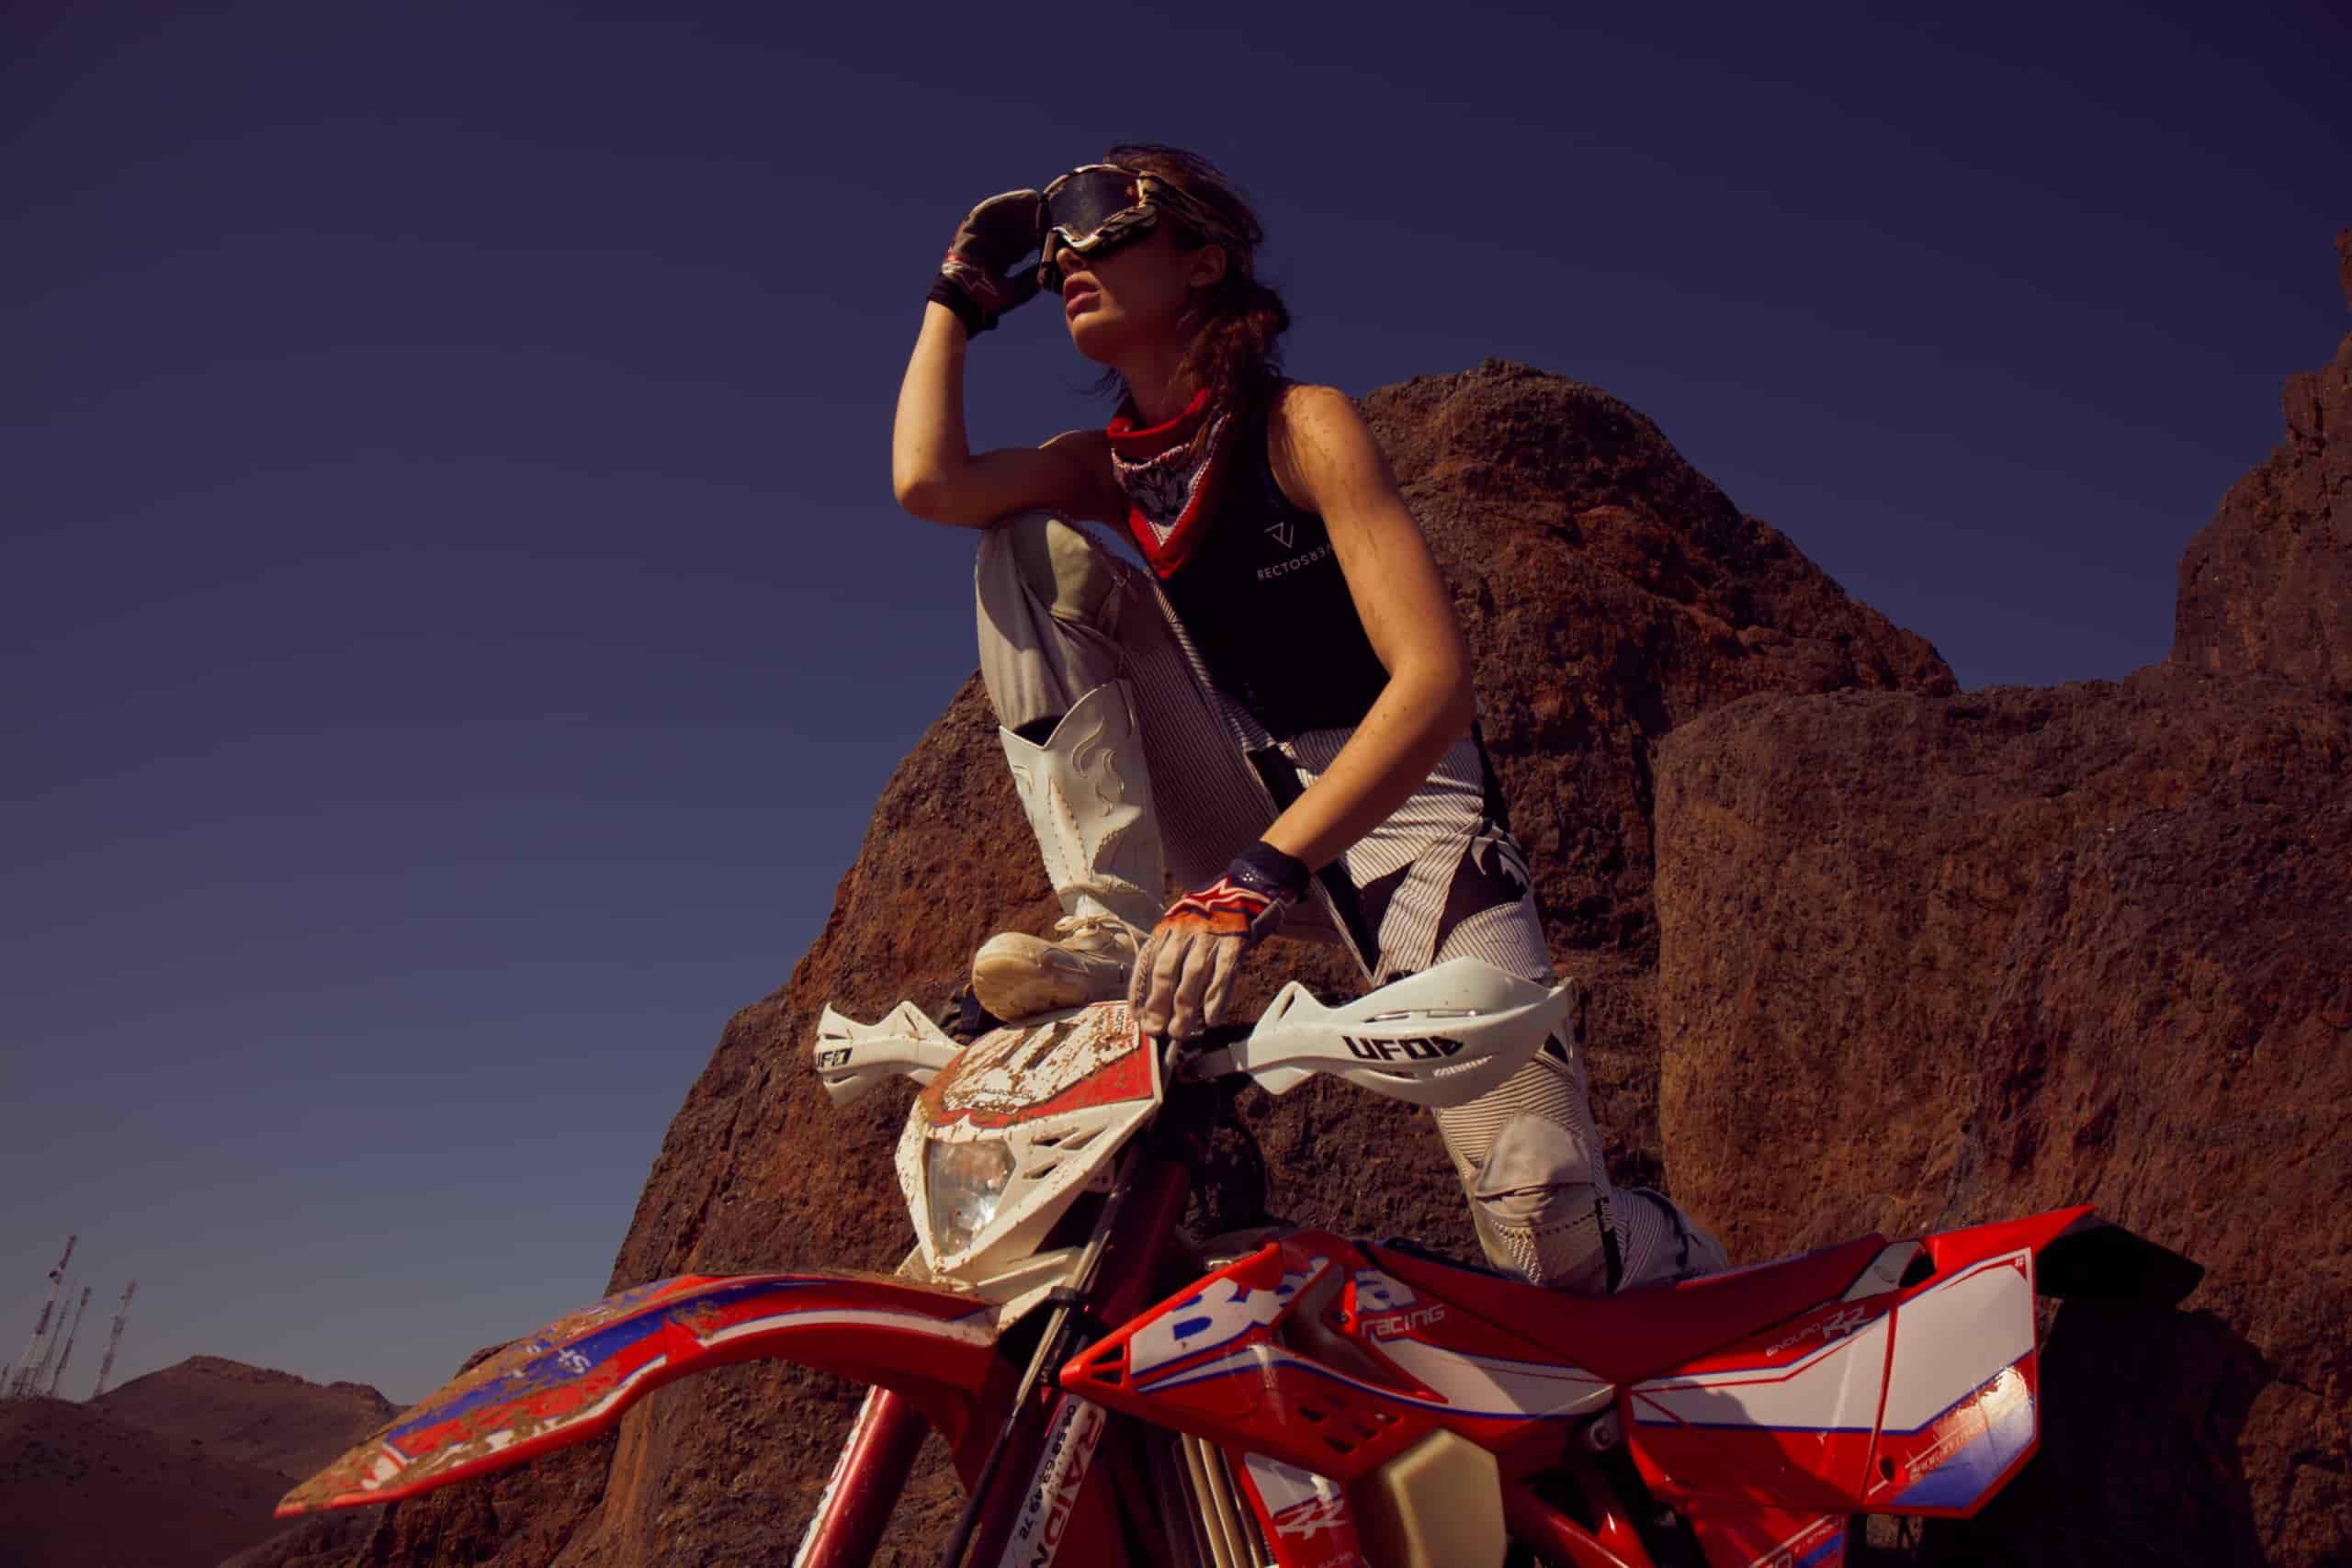 rv-c1-motorcycle-women-white-air-glasses